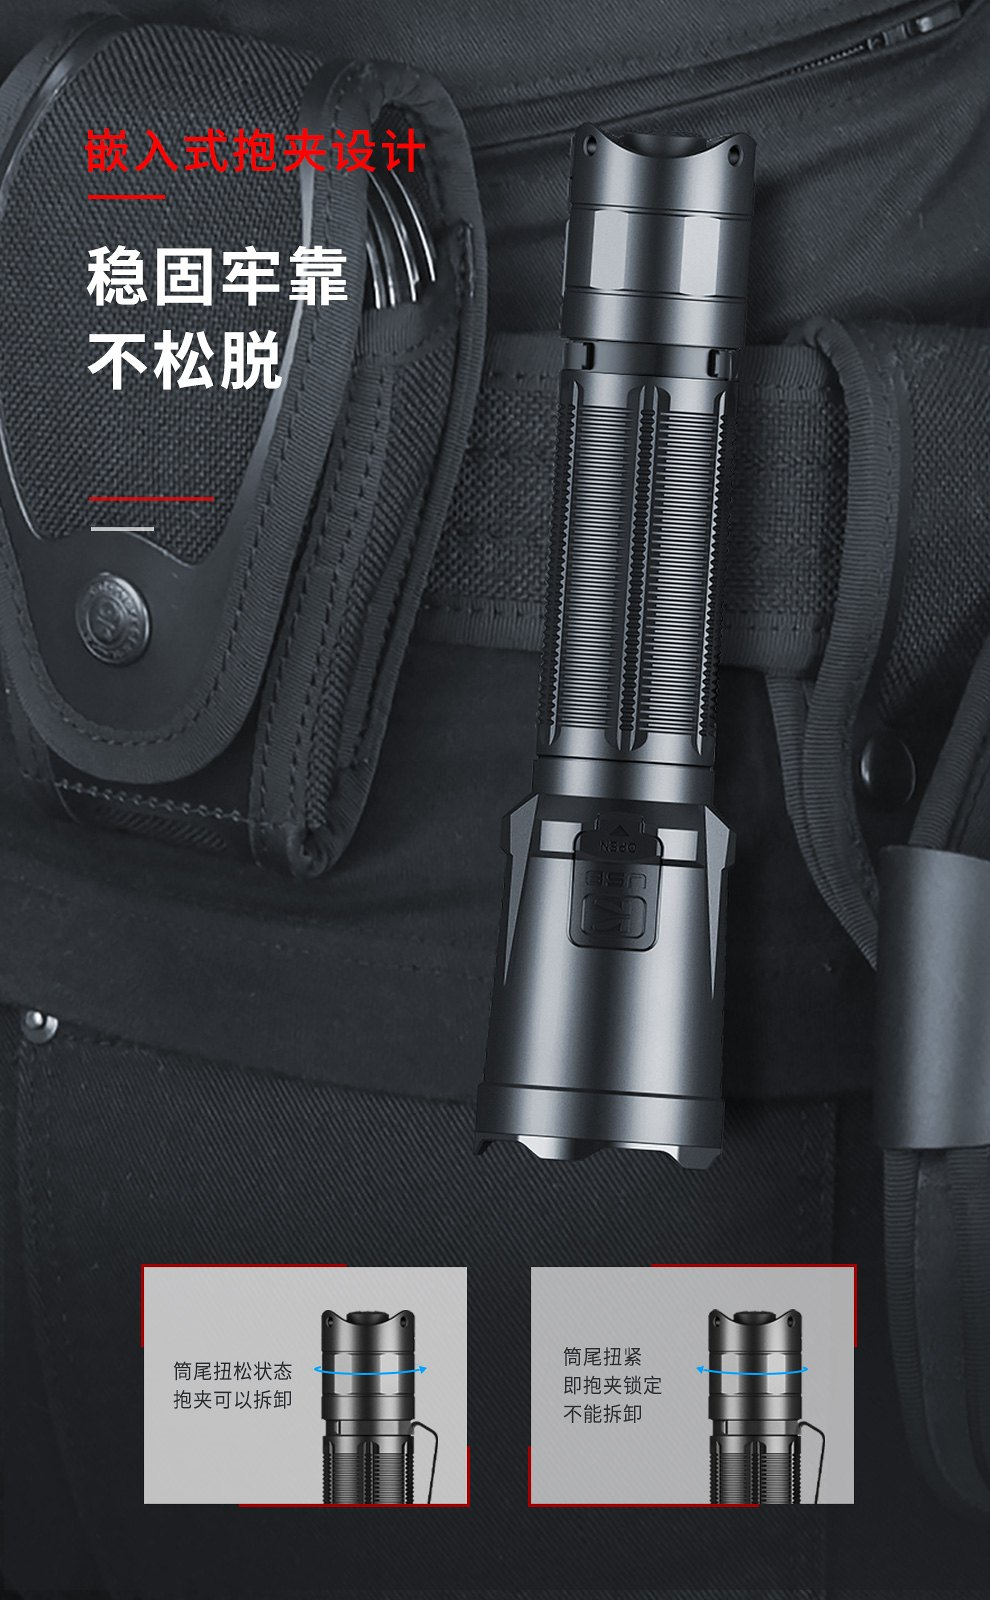 KLARUS XT21C 戰術手電筒 3200流明 -9